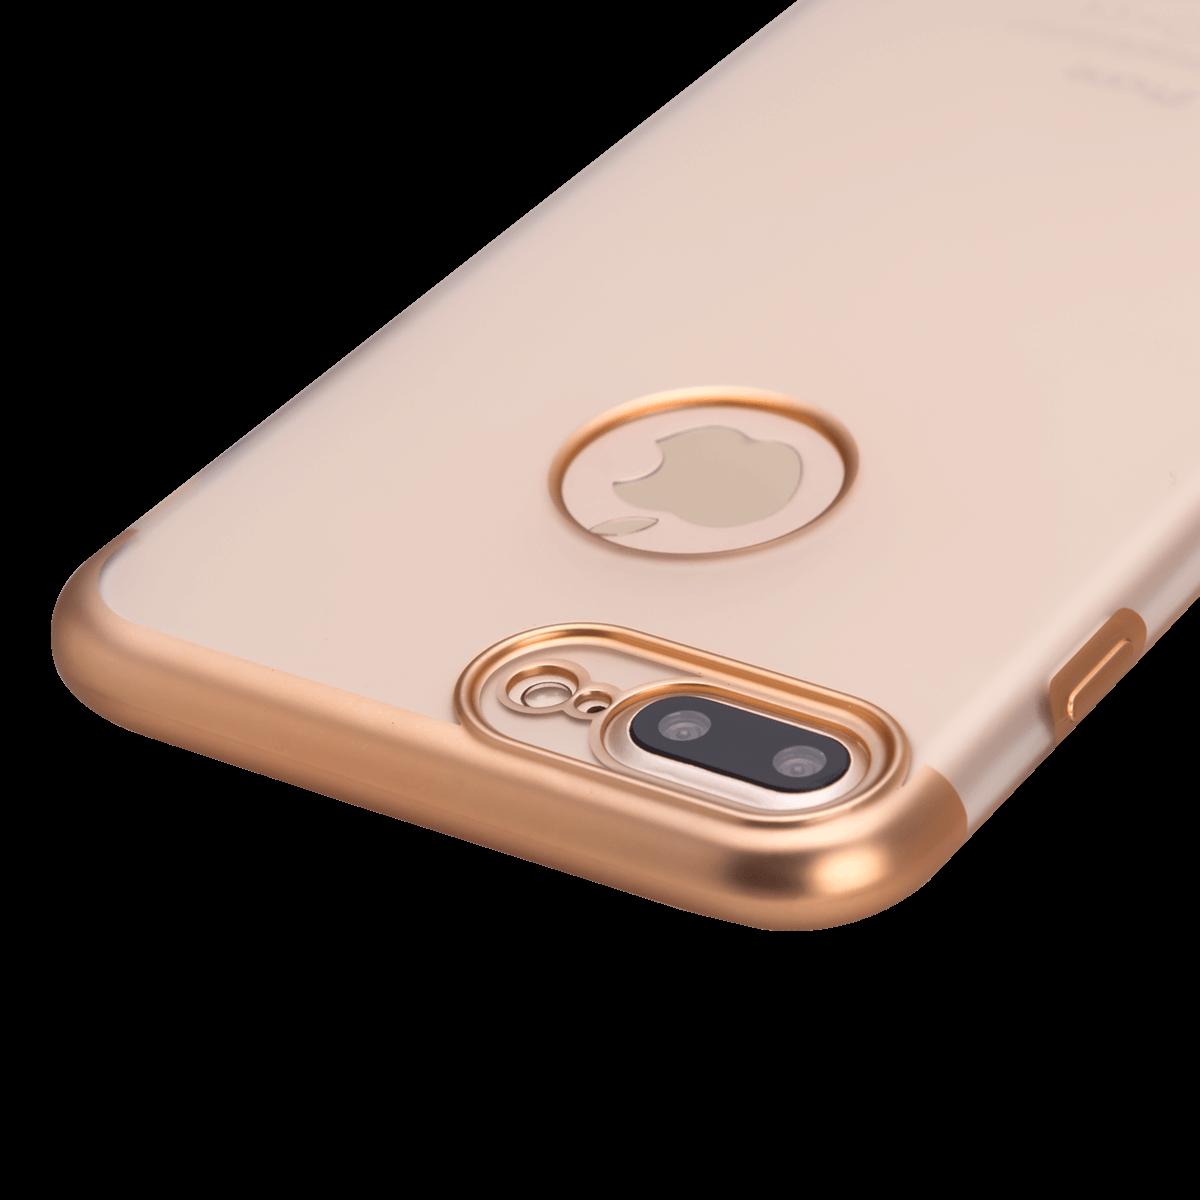 iPhone 7/8 Plus için spada TRIO Seffaf Gold TPU Kapak